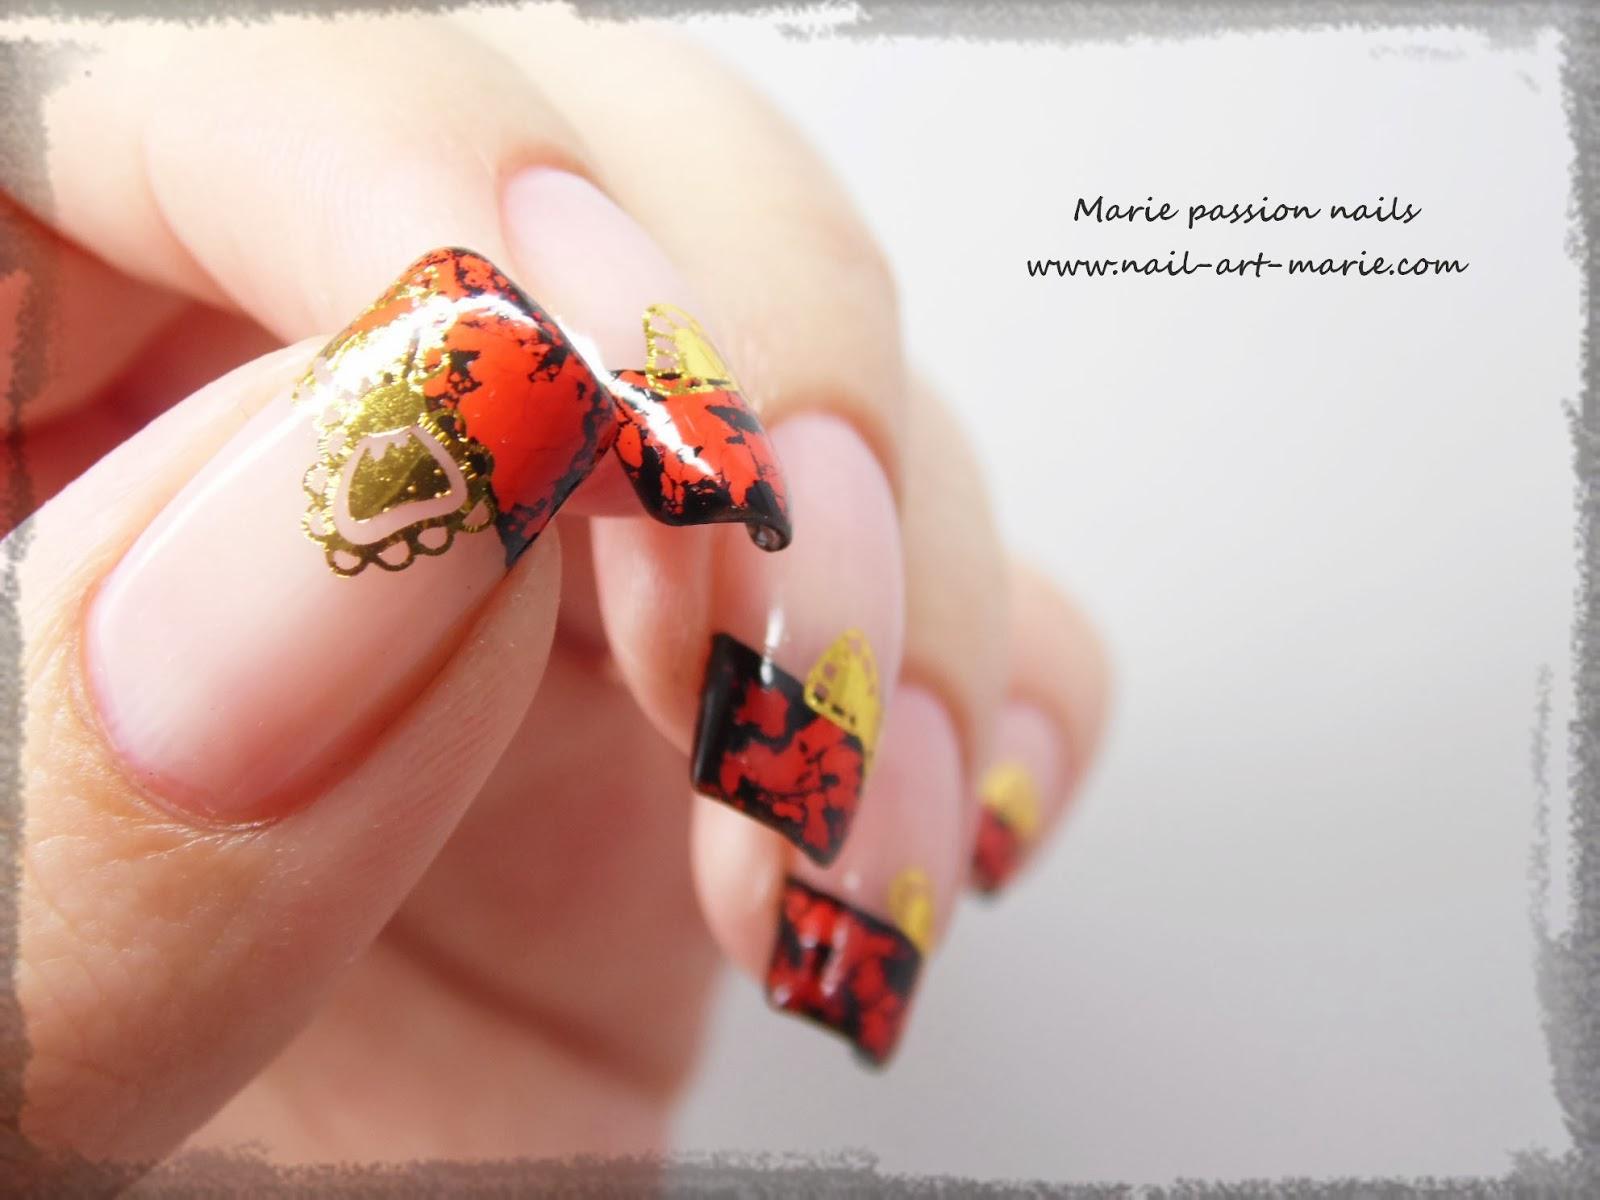 Nail Art avec craquelures de foils matte4